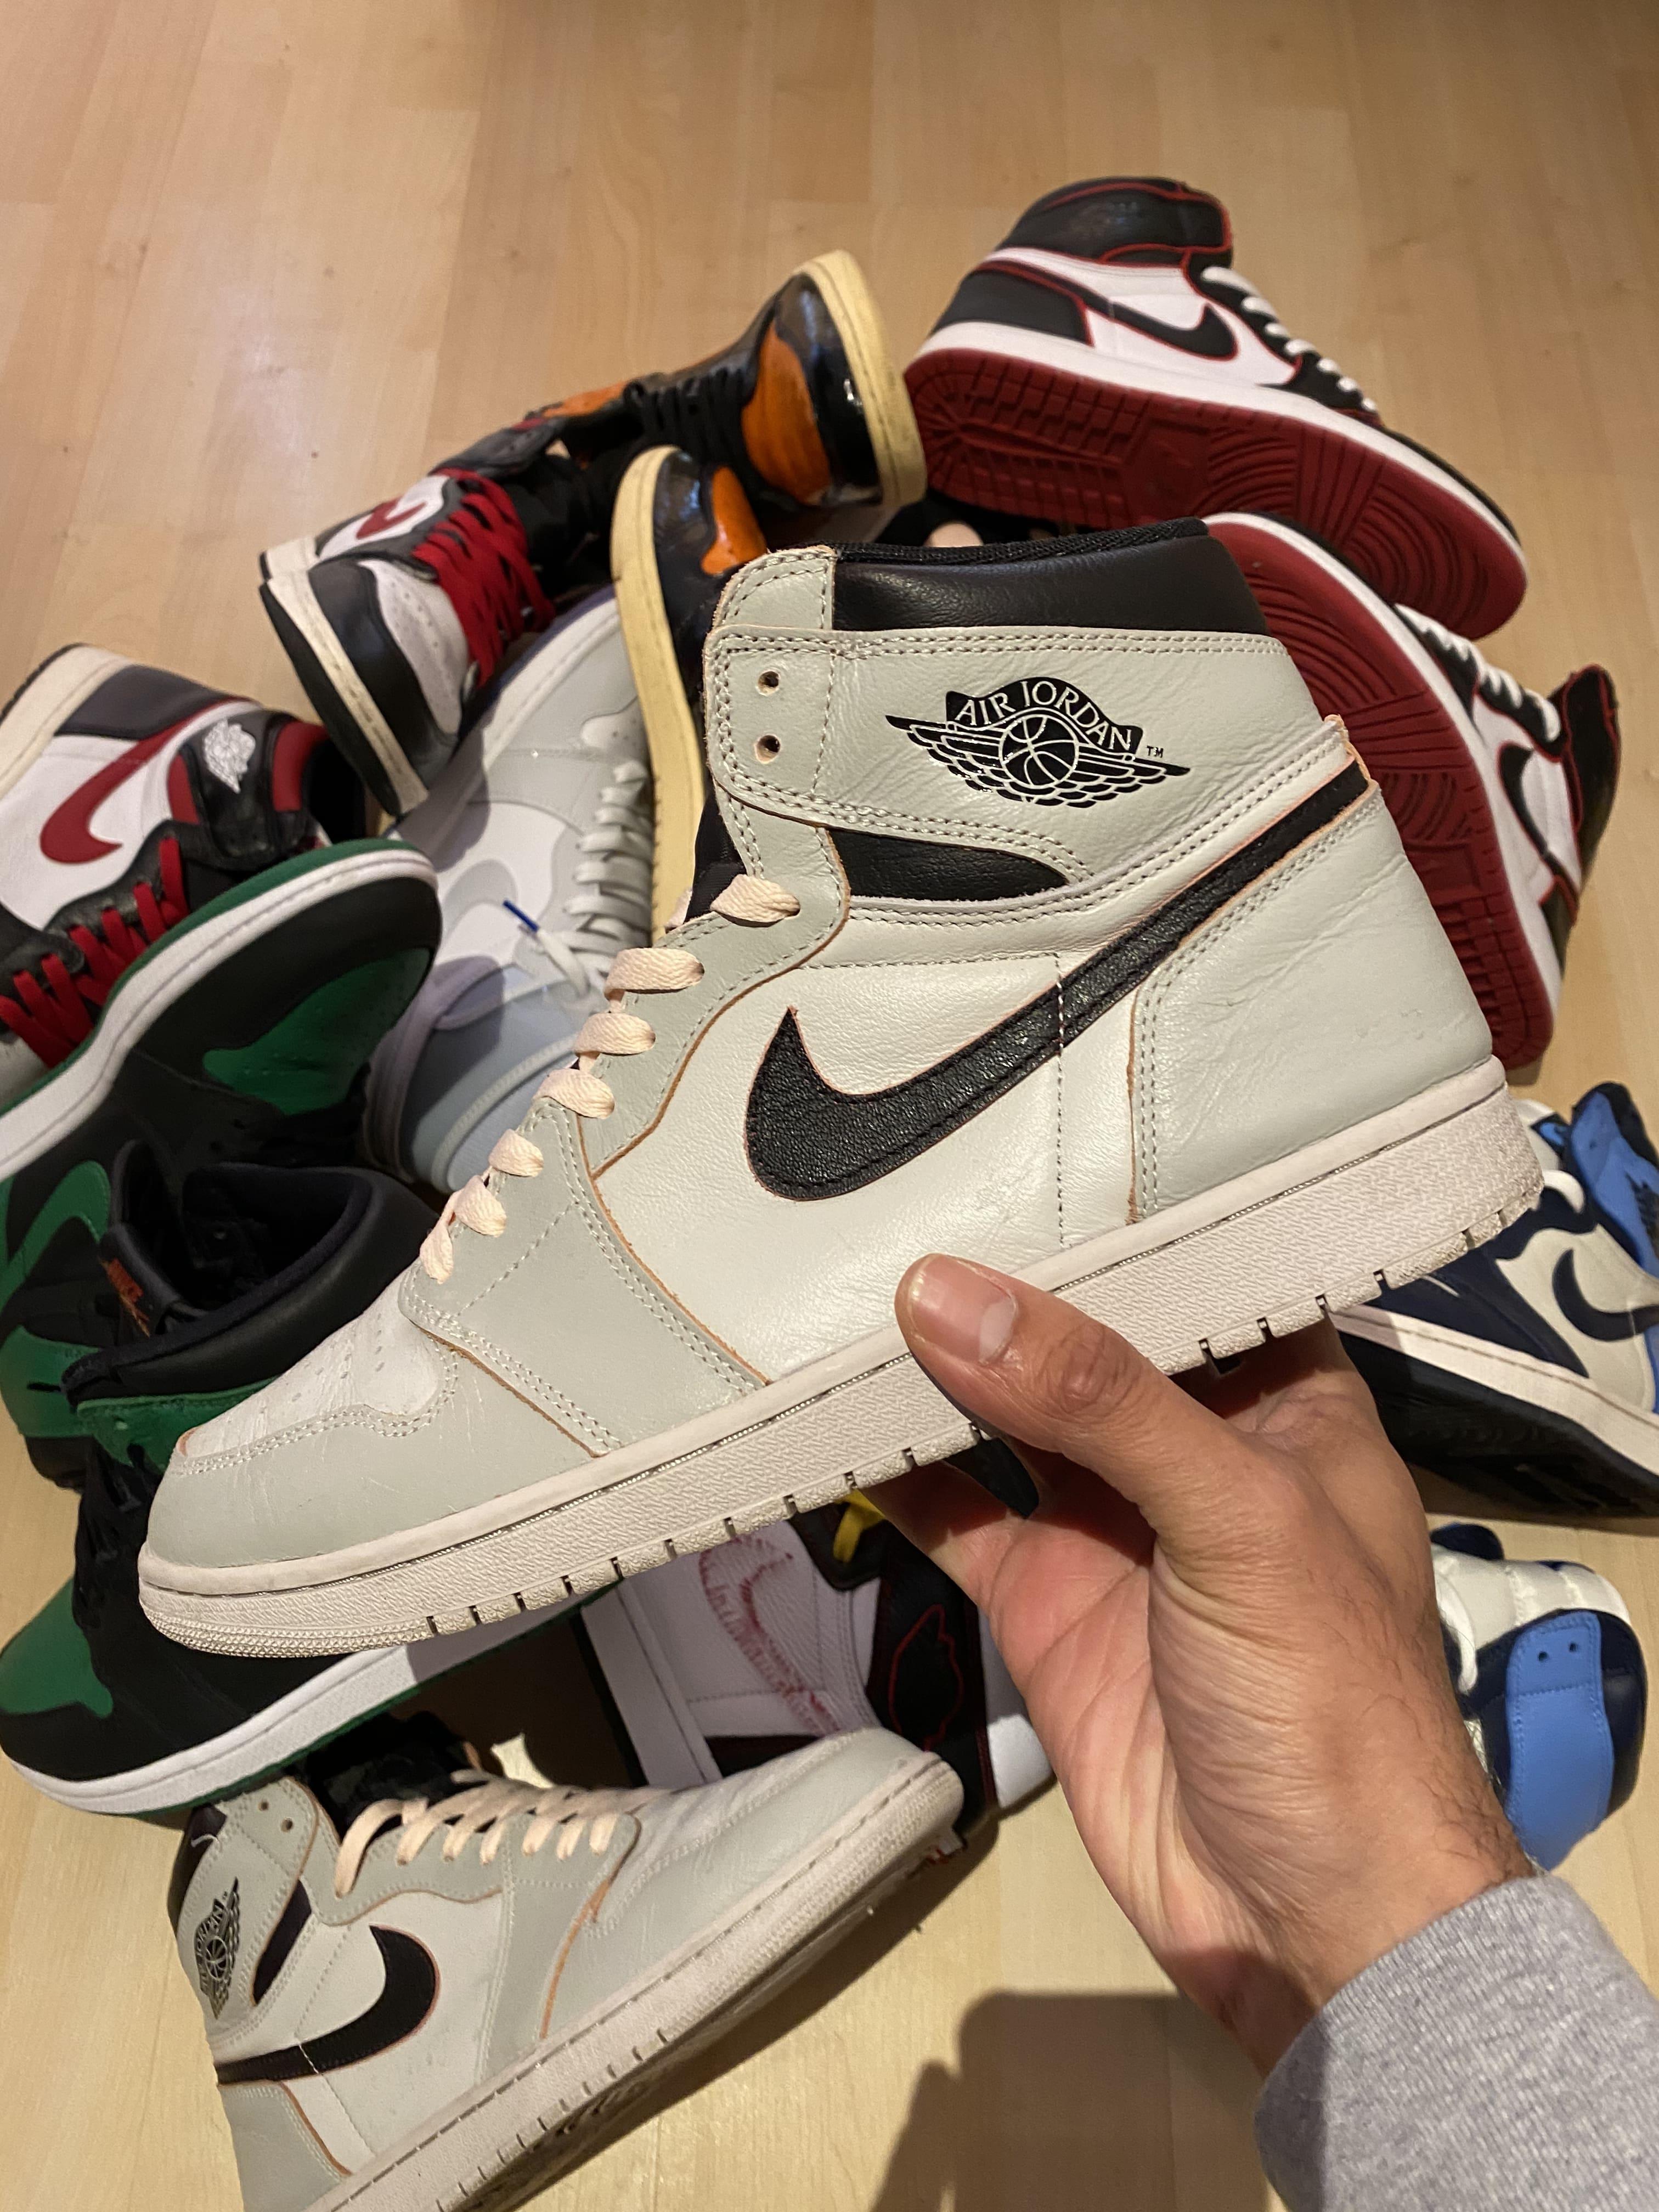 Air Jordan 1 x Nike SB 'NYC to Paris' - 2019